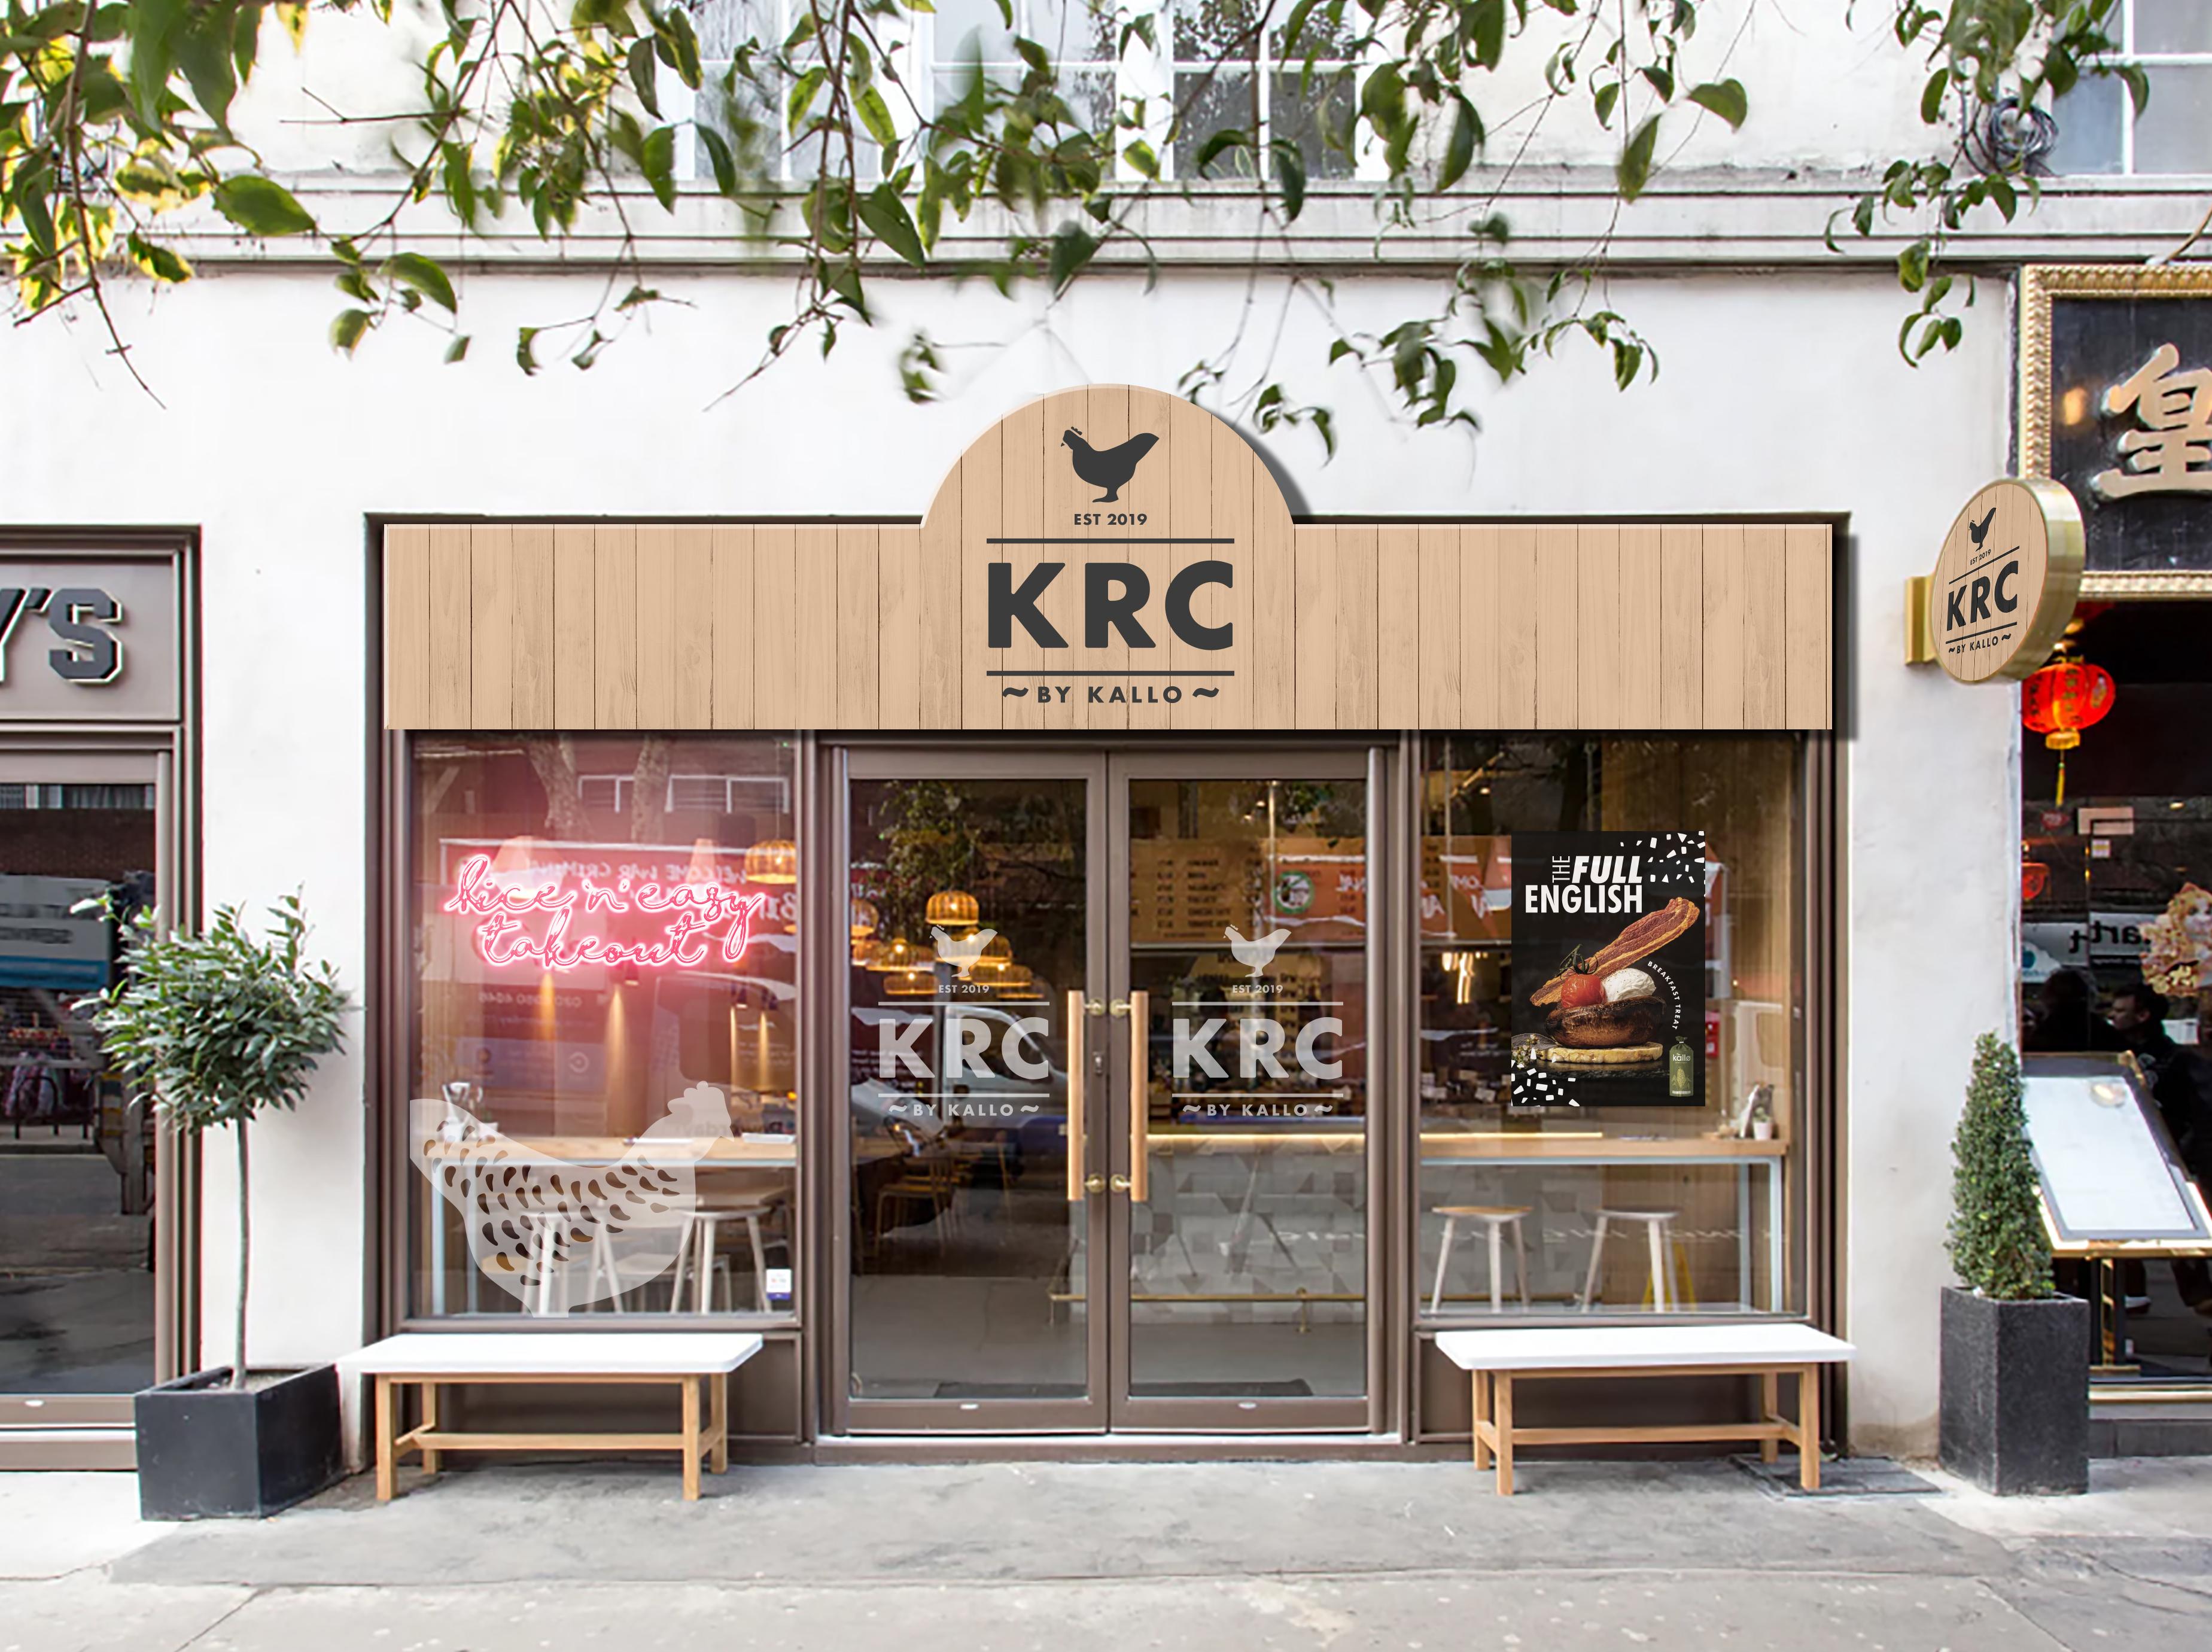 KRC by Kallo Exterior.jpg